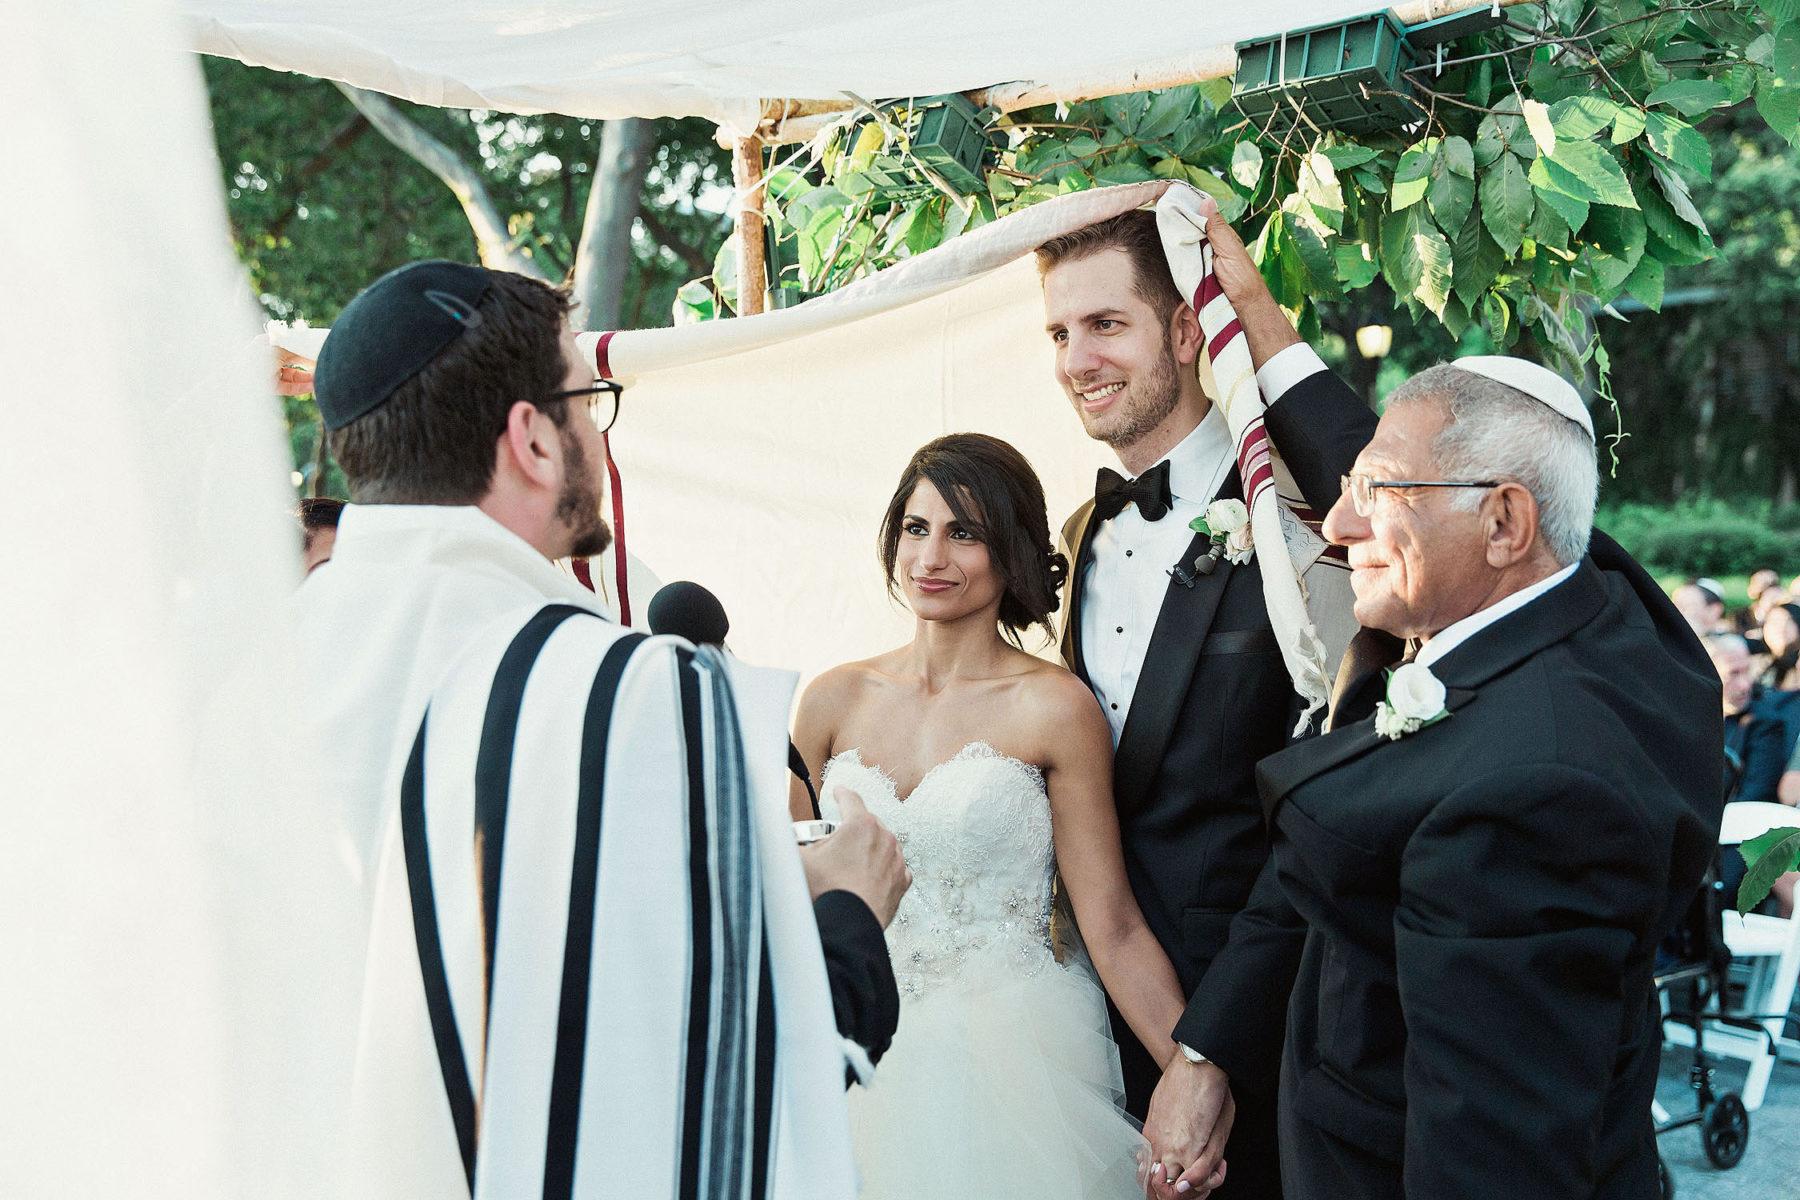 Best Jewish Wedding Ceremony Photos - Cool Jewish Wedding Photographers